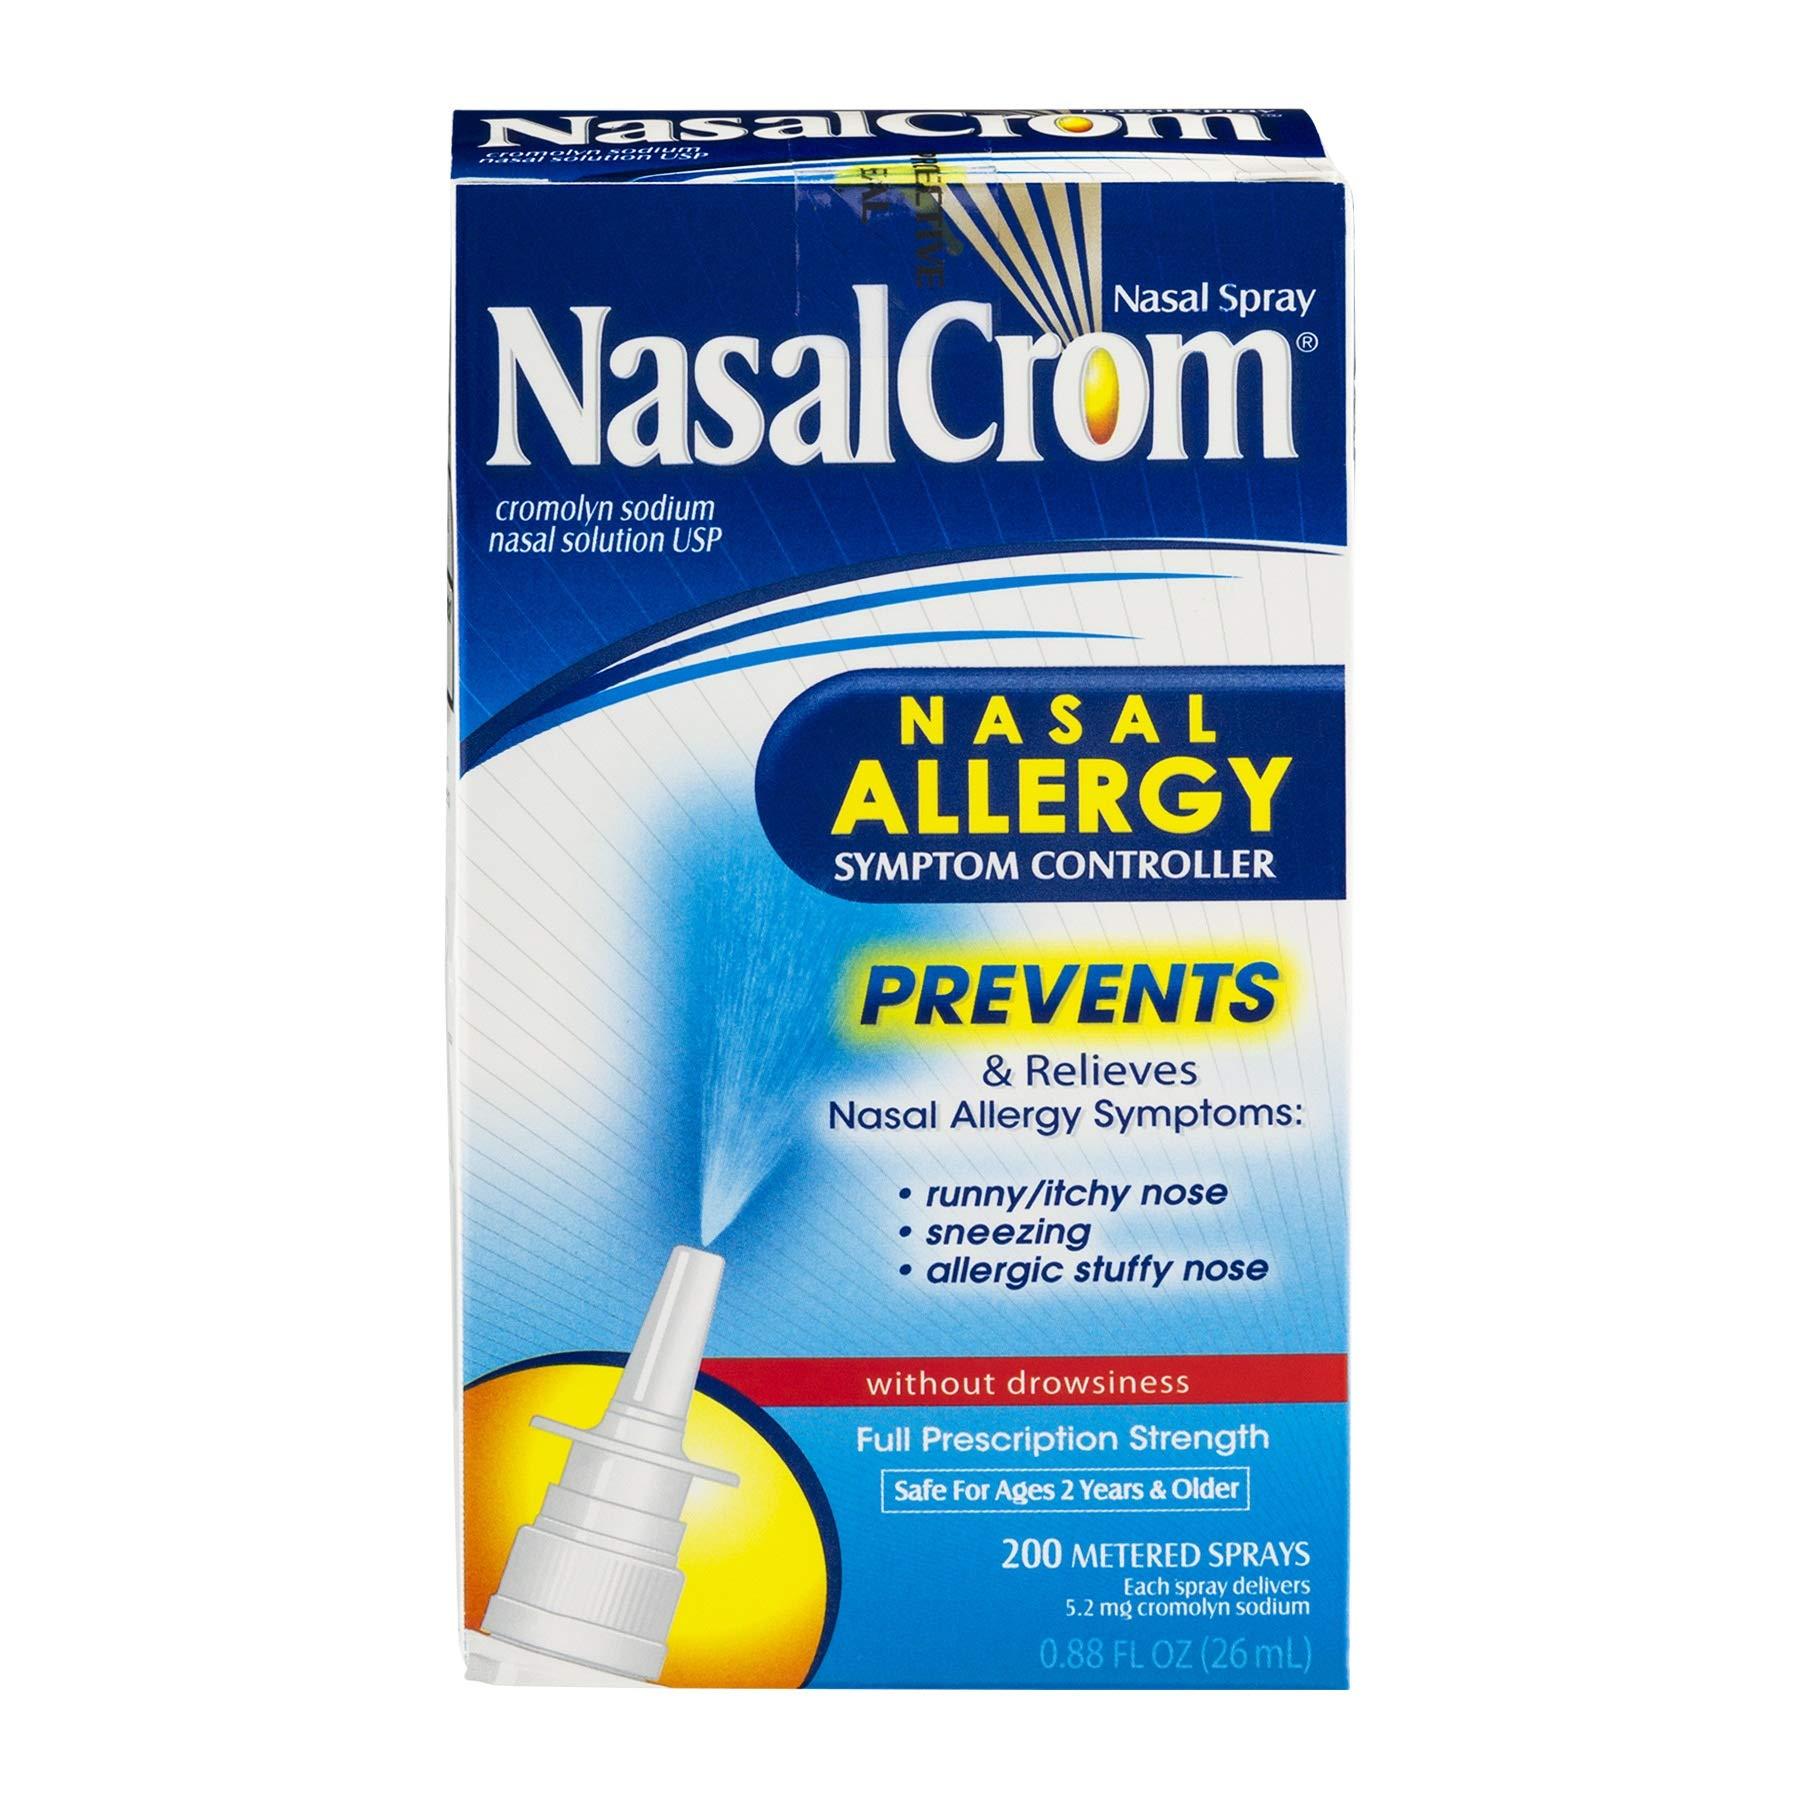 NasalCrom Nasal Allergy Symptom Controller Spray - 0.88 oz, Pack of 4 by Nasal Crom